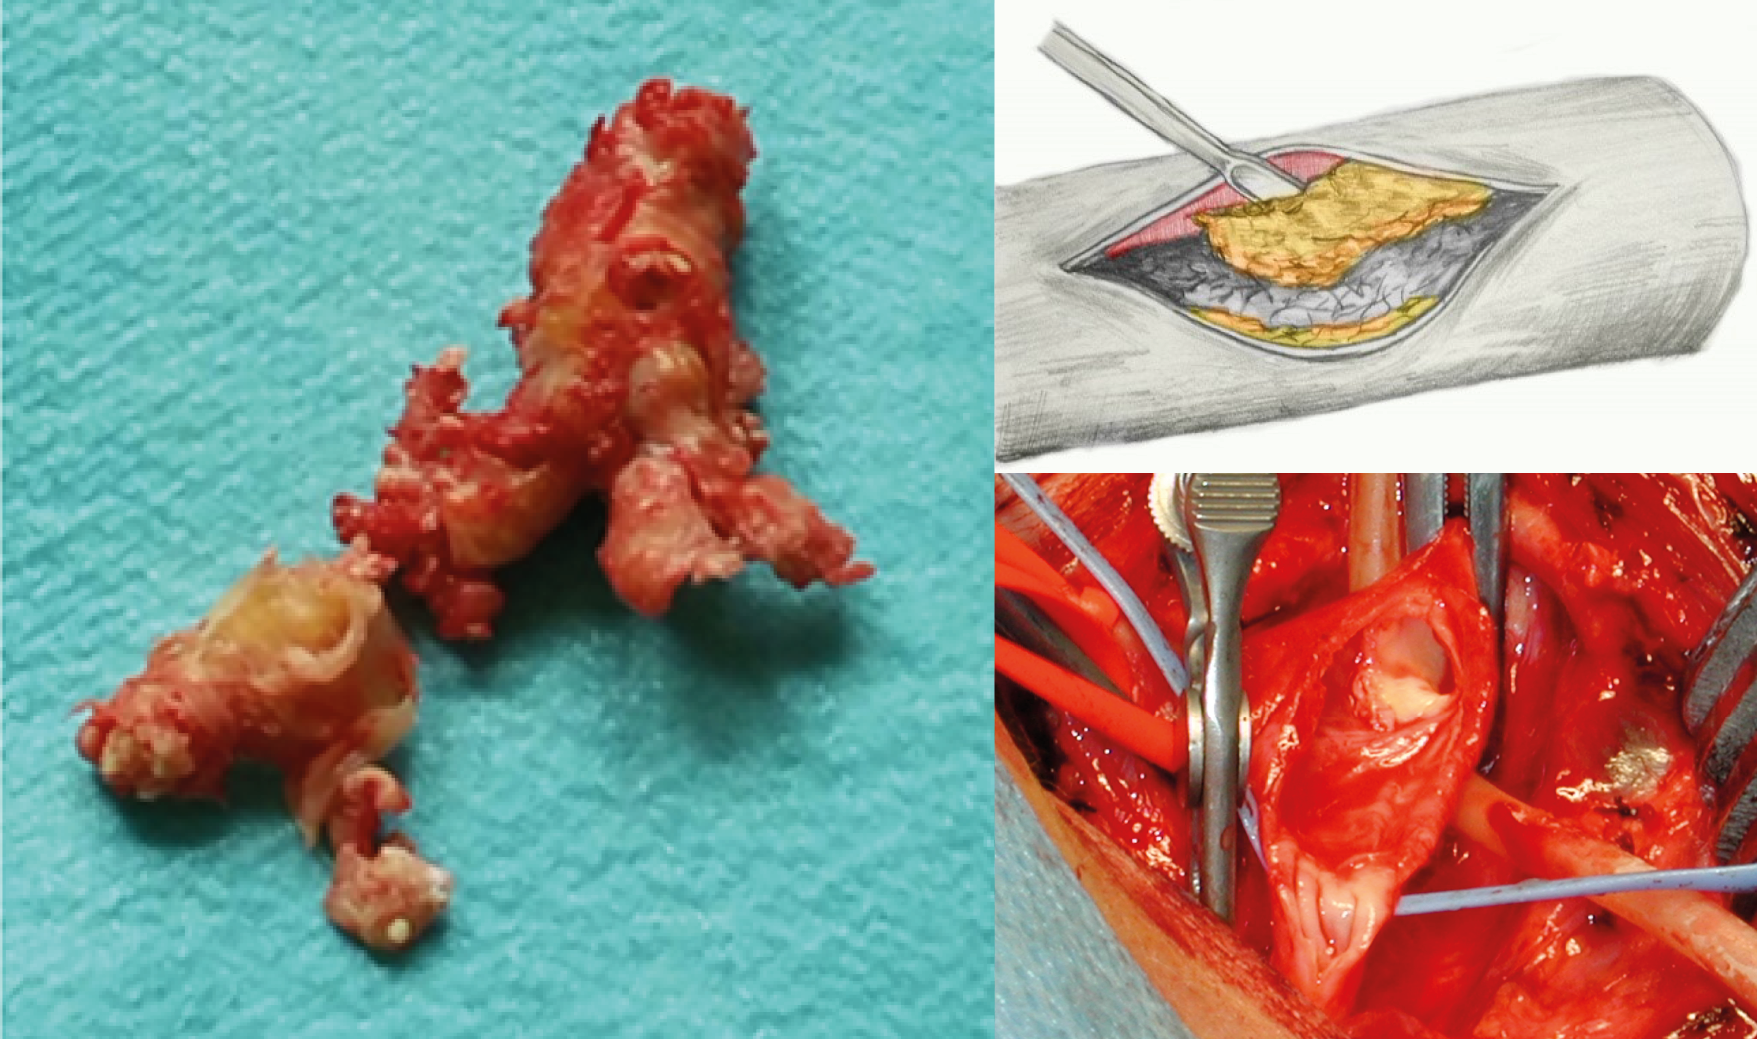 Thrombendarterektomie